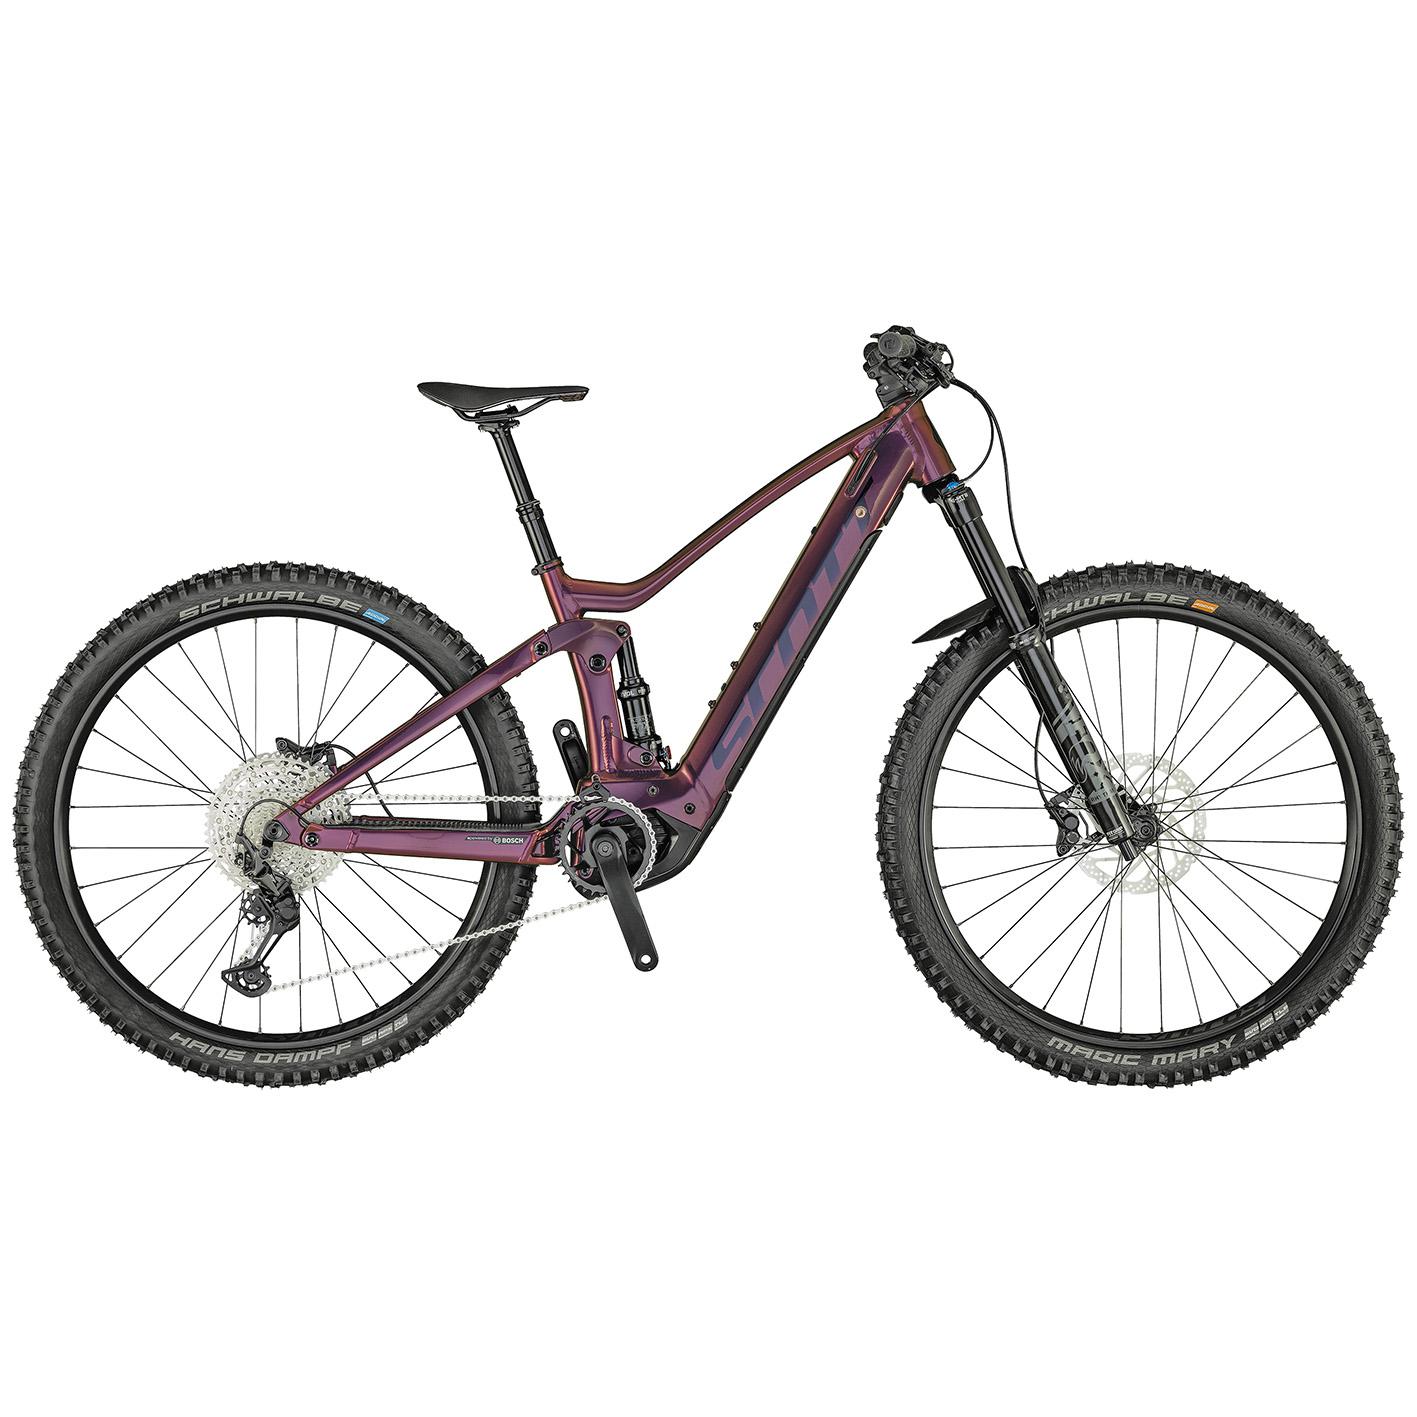 Scott contessa eGenius - Verbier bike shop